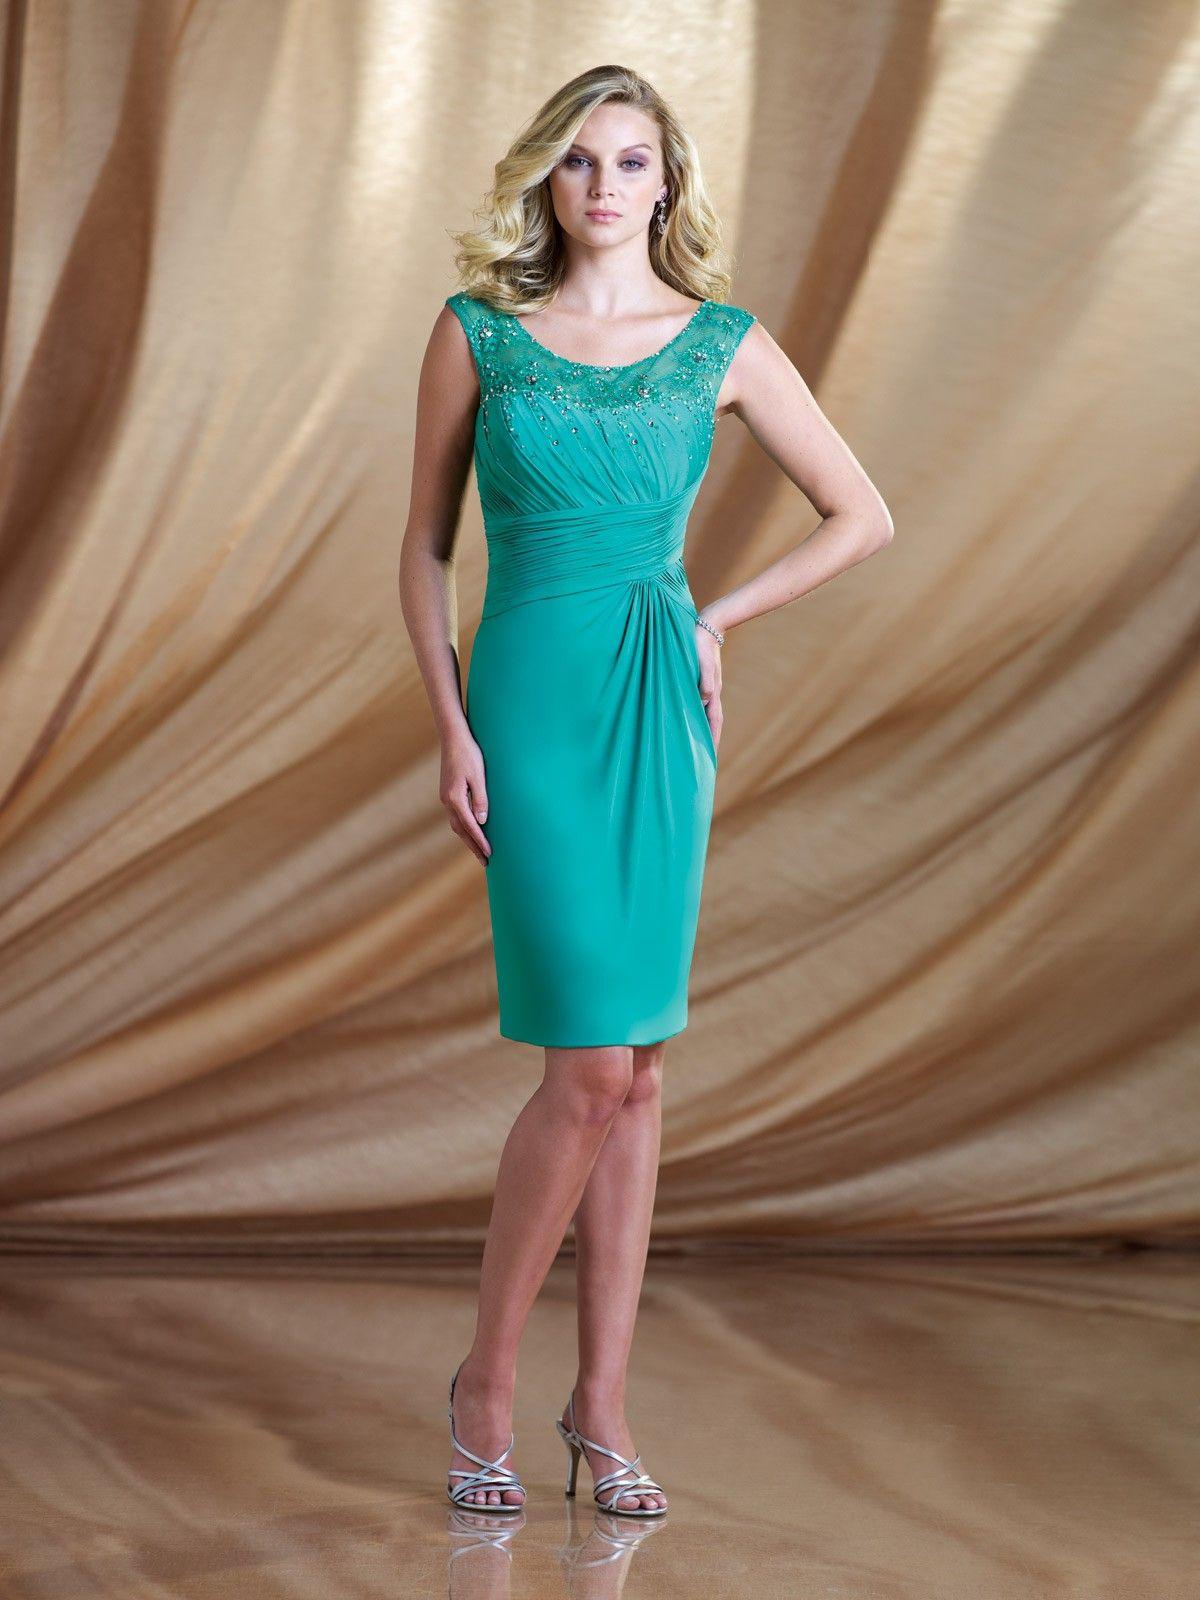 Knee Length Cocktail Dresses | fashionoah.com | Best Knee Length ...